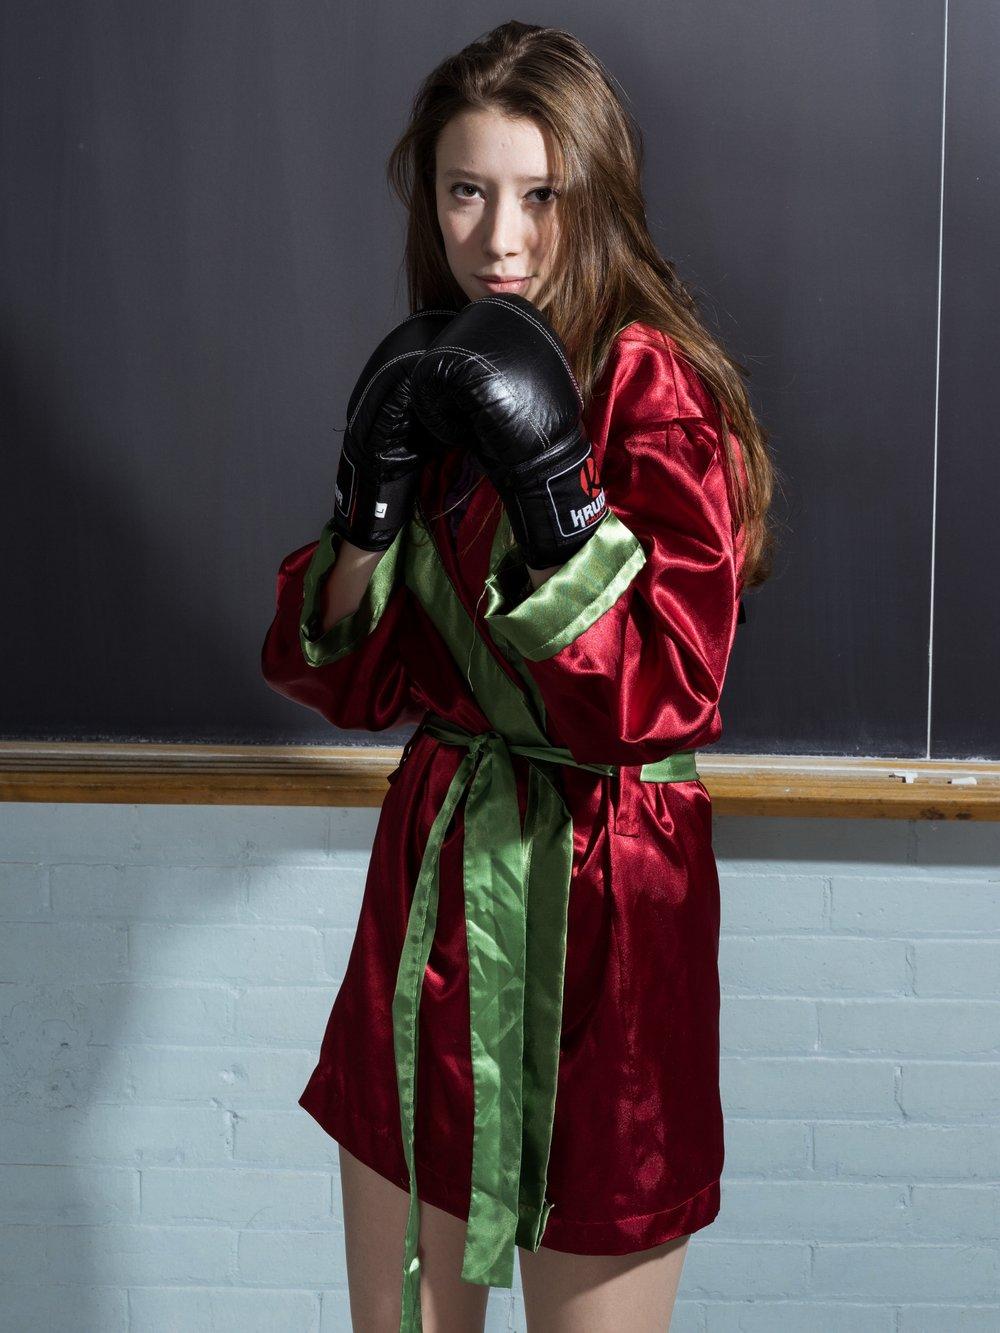 Lauren Levorson-Wong